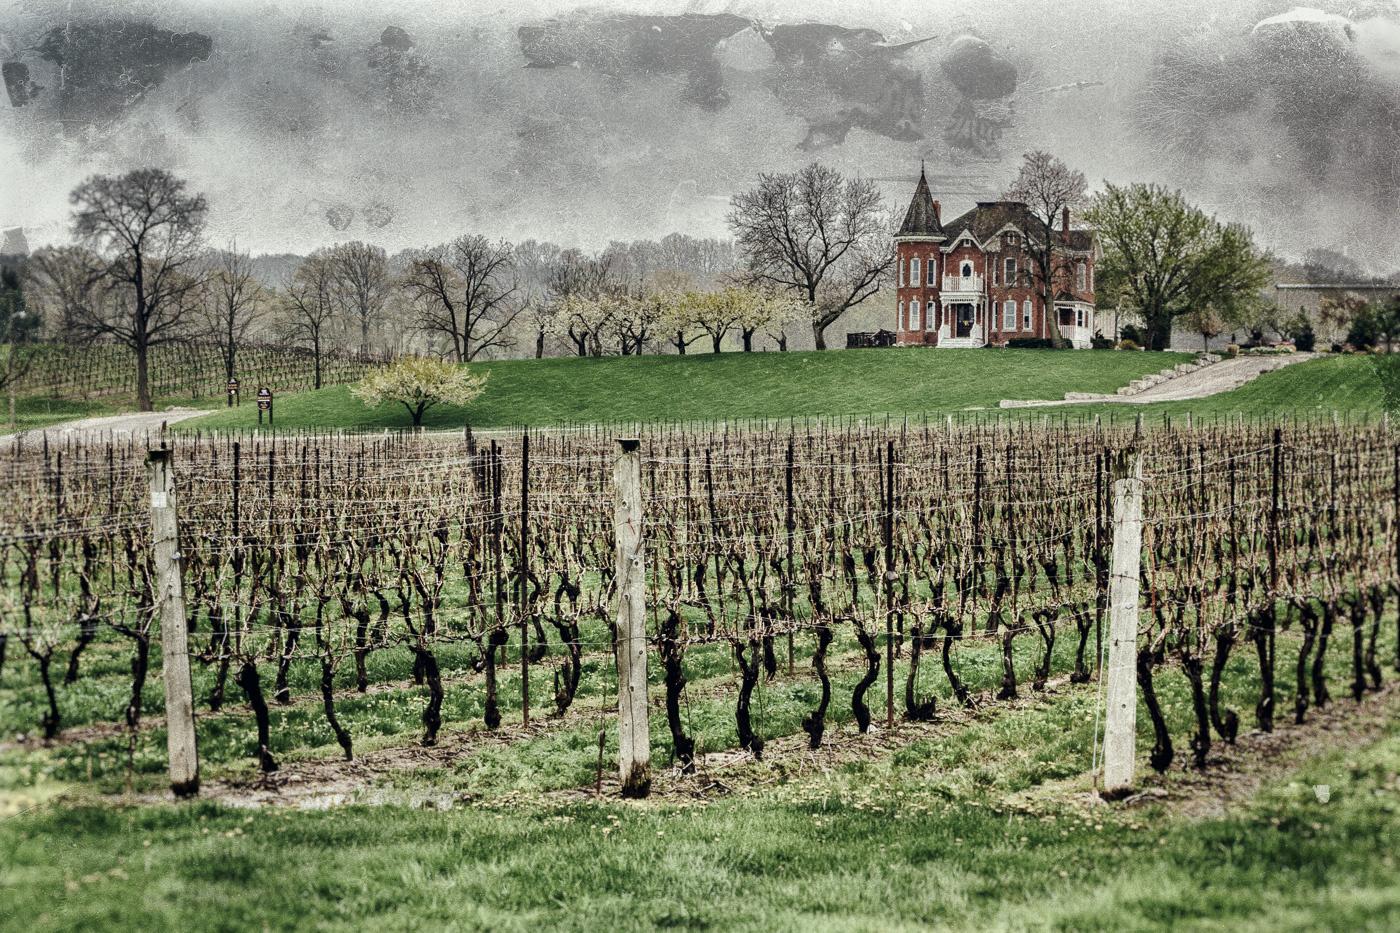 Peninsula Ridge Winery by vartkes peltekoglu